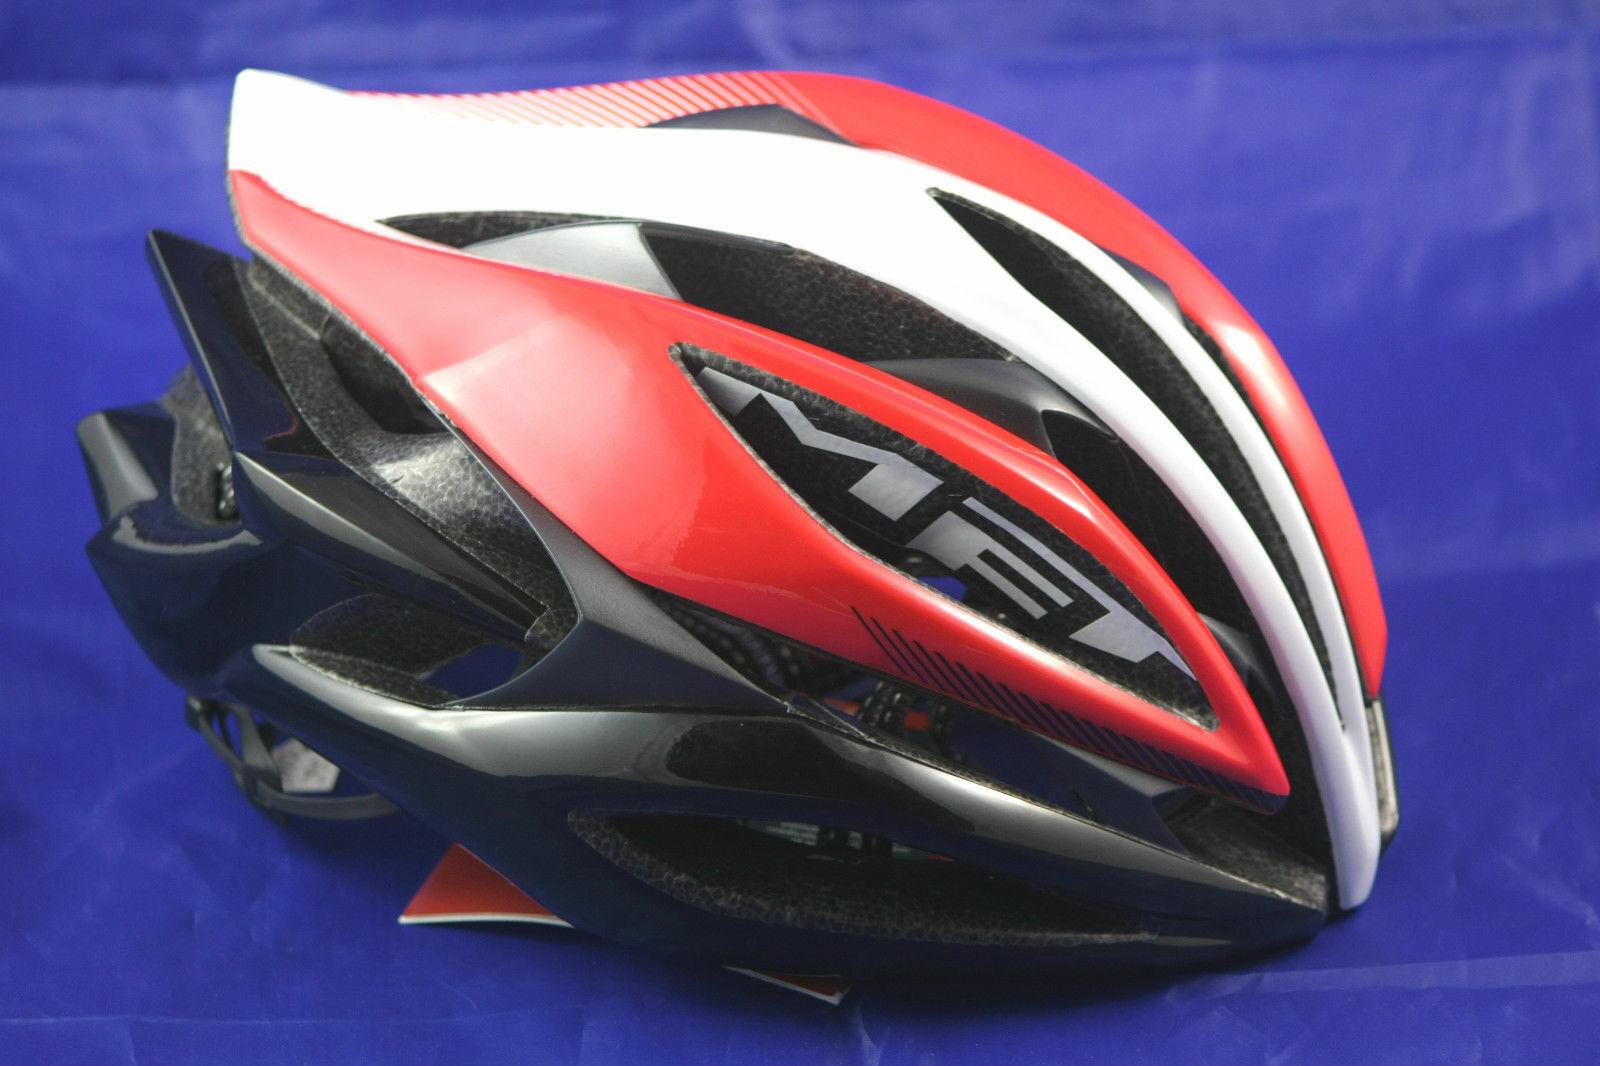 CASCO Met Pro Race Sine Thesis M 5457cm rosso anno 2014